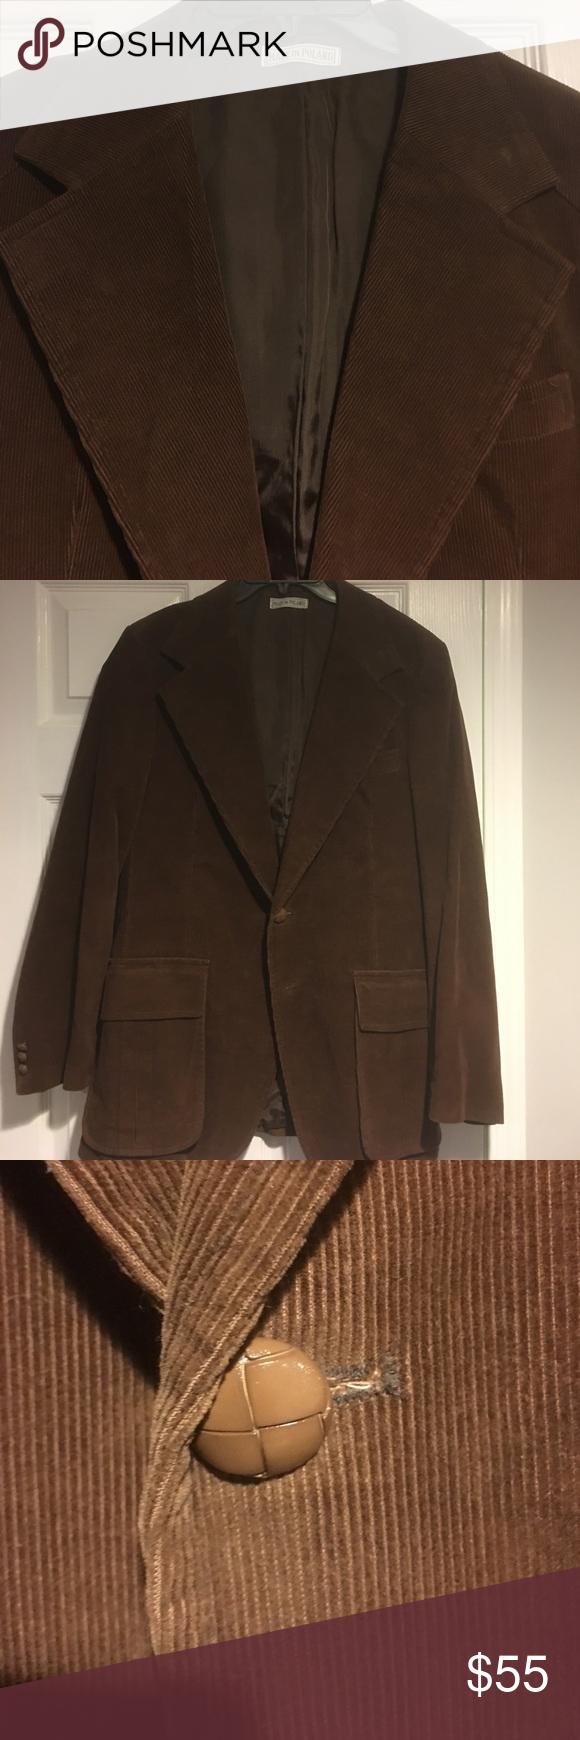 Scott's Gray Ltd brown retro corduroy sports coat | Coats, Blazers ...